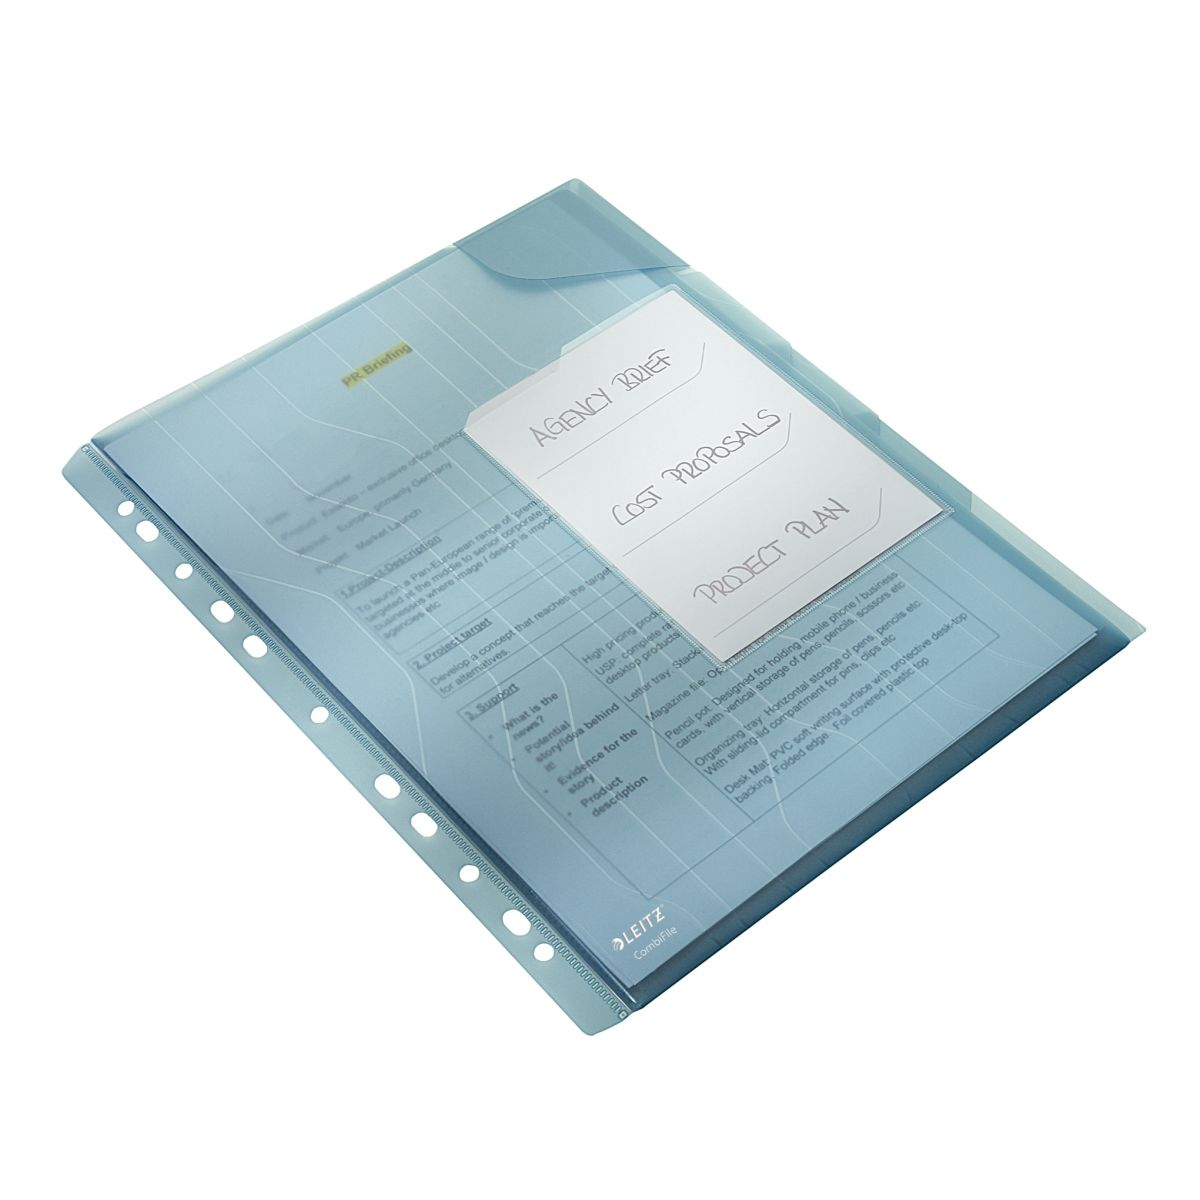 Pasta L Organizadora Esselte Leitz Combifile Azul 3x20 fls com 3 unid. 63485